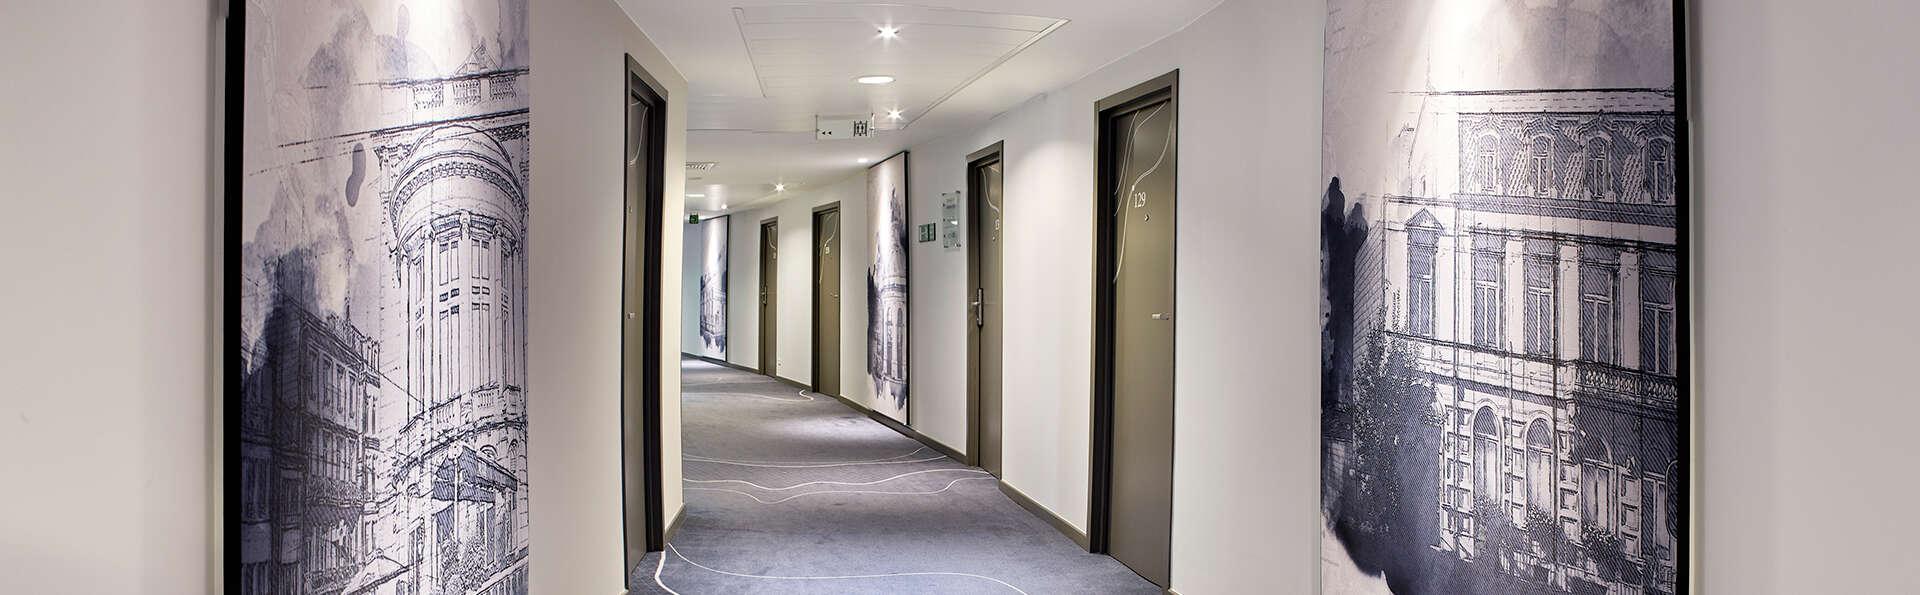 Radisson Blu Palace Hotel - EDIT_NEW_superior3.jpg